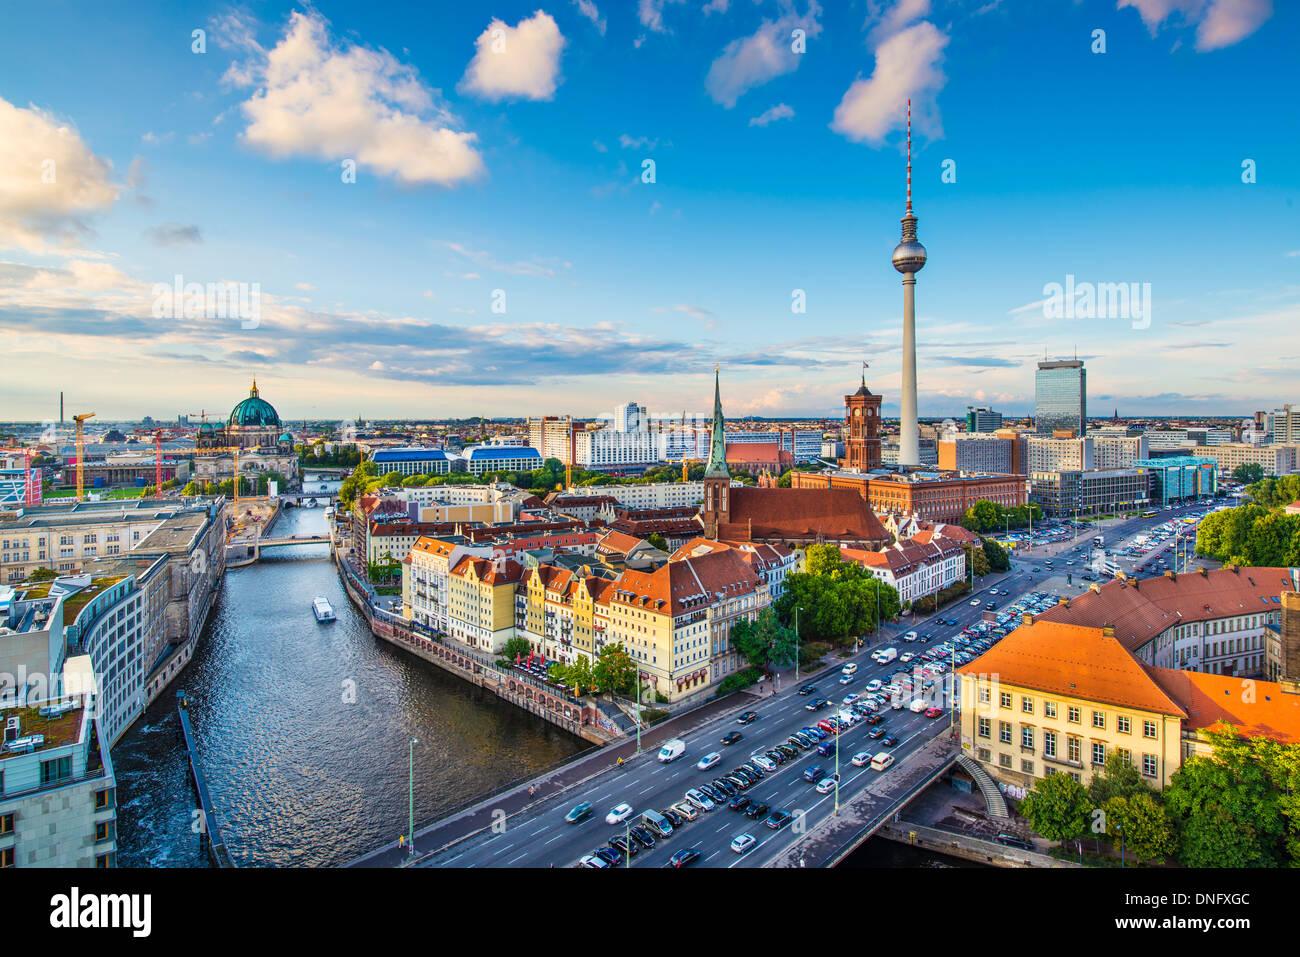 Berlin, Germany skyline over the Spree River. - Stock Image